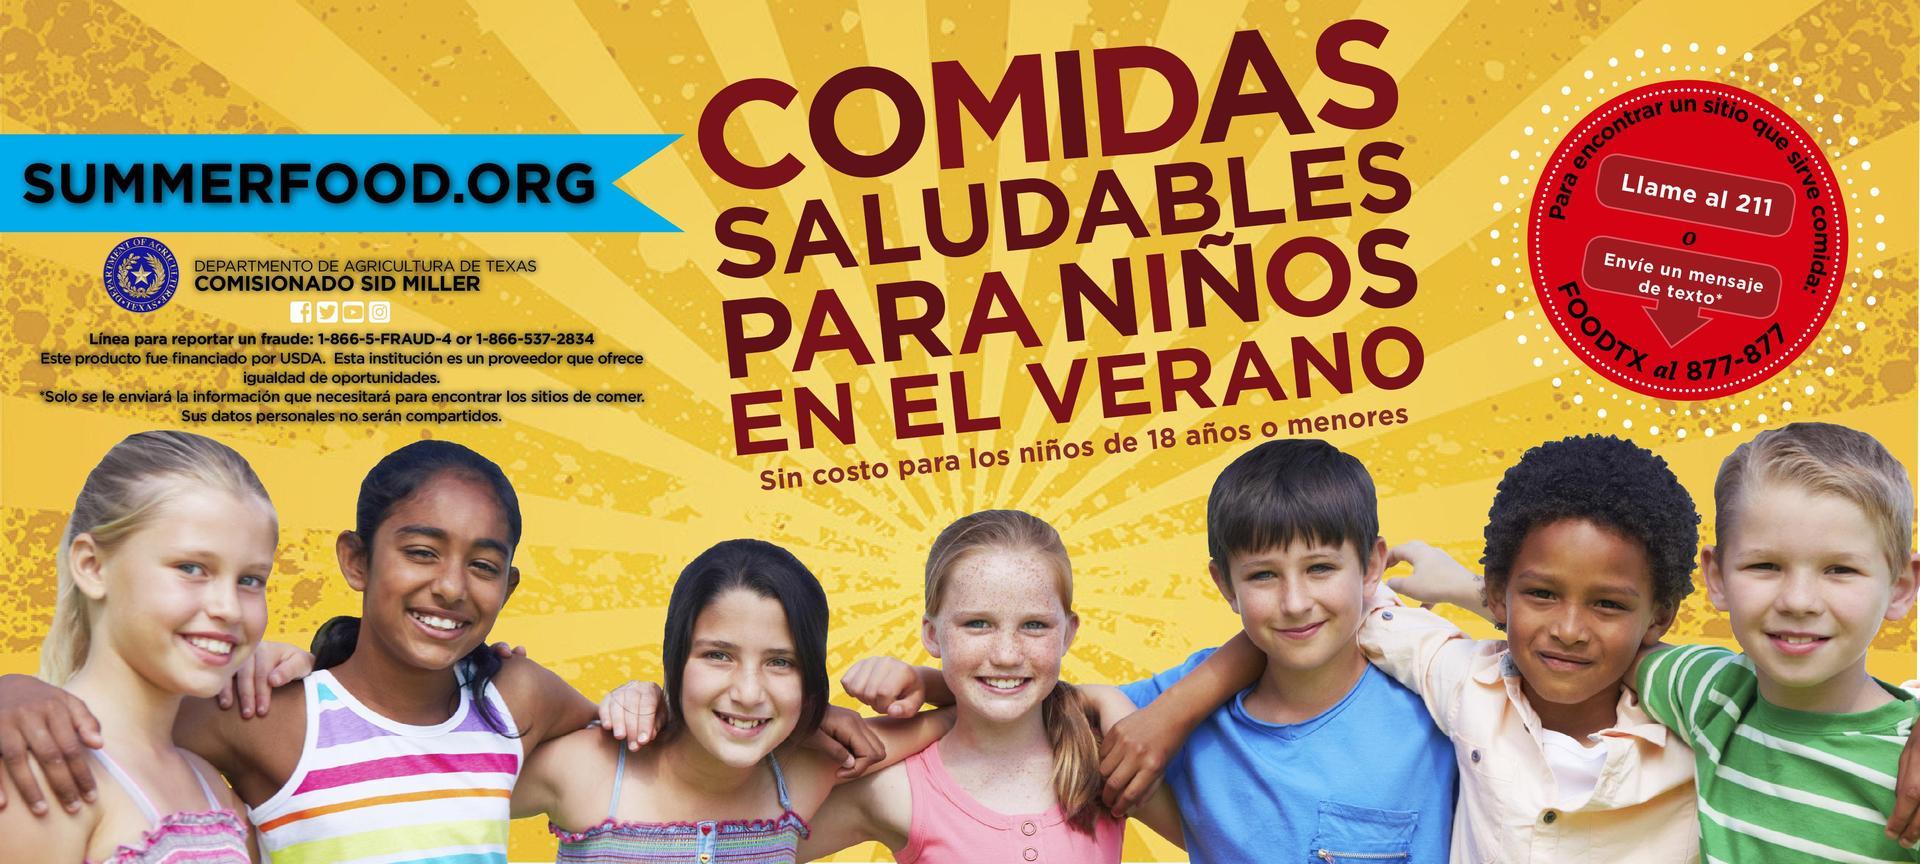 Healthy Summer Meals Spanish Version